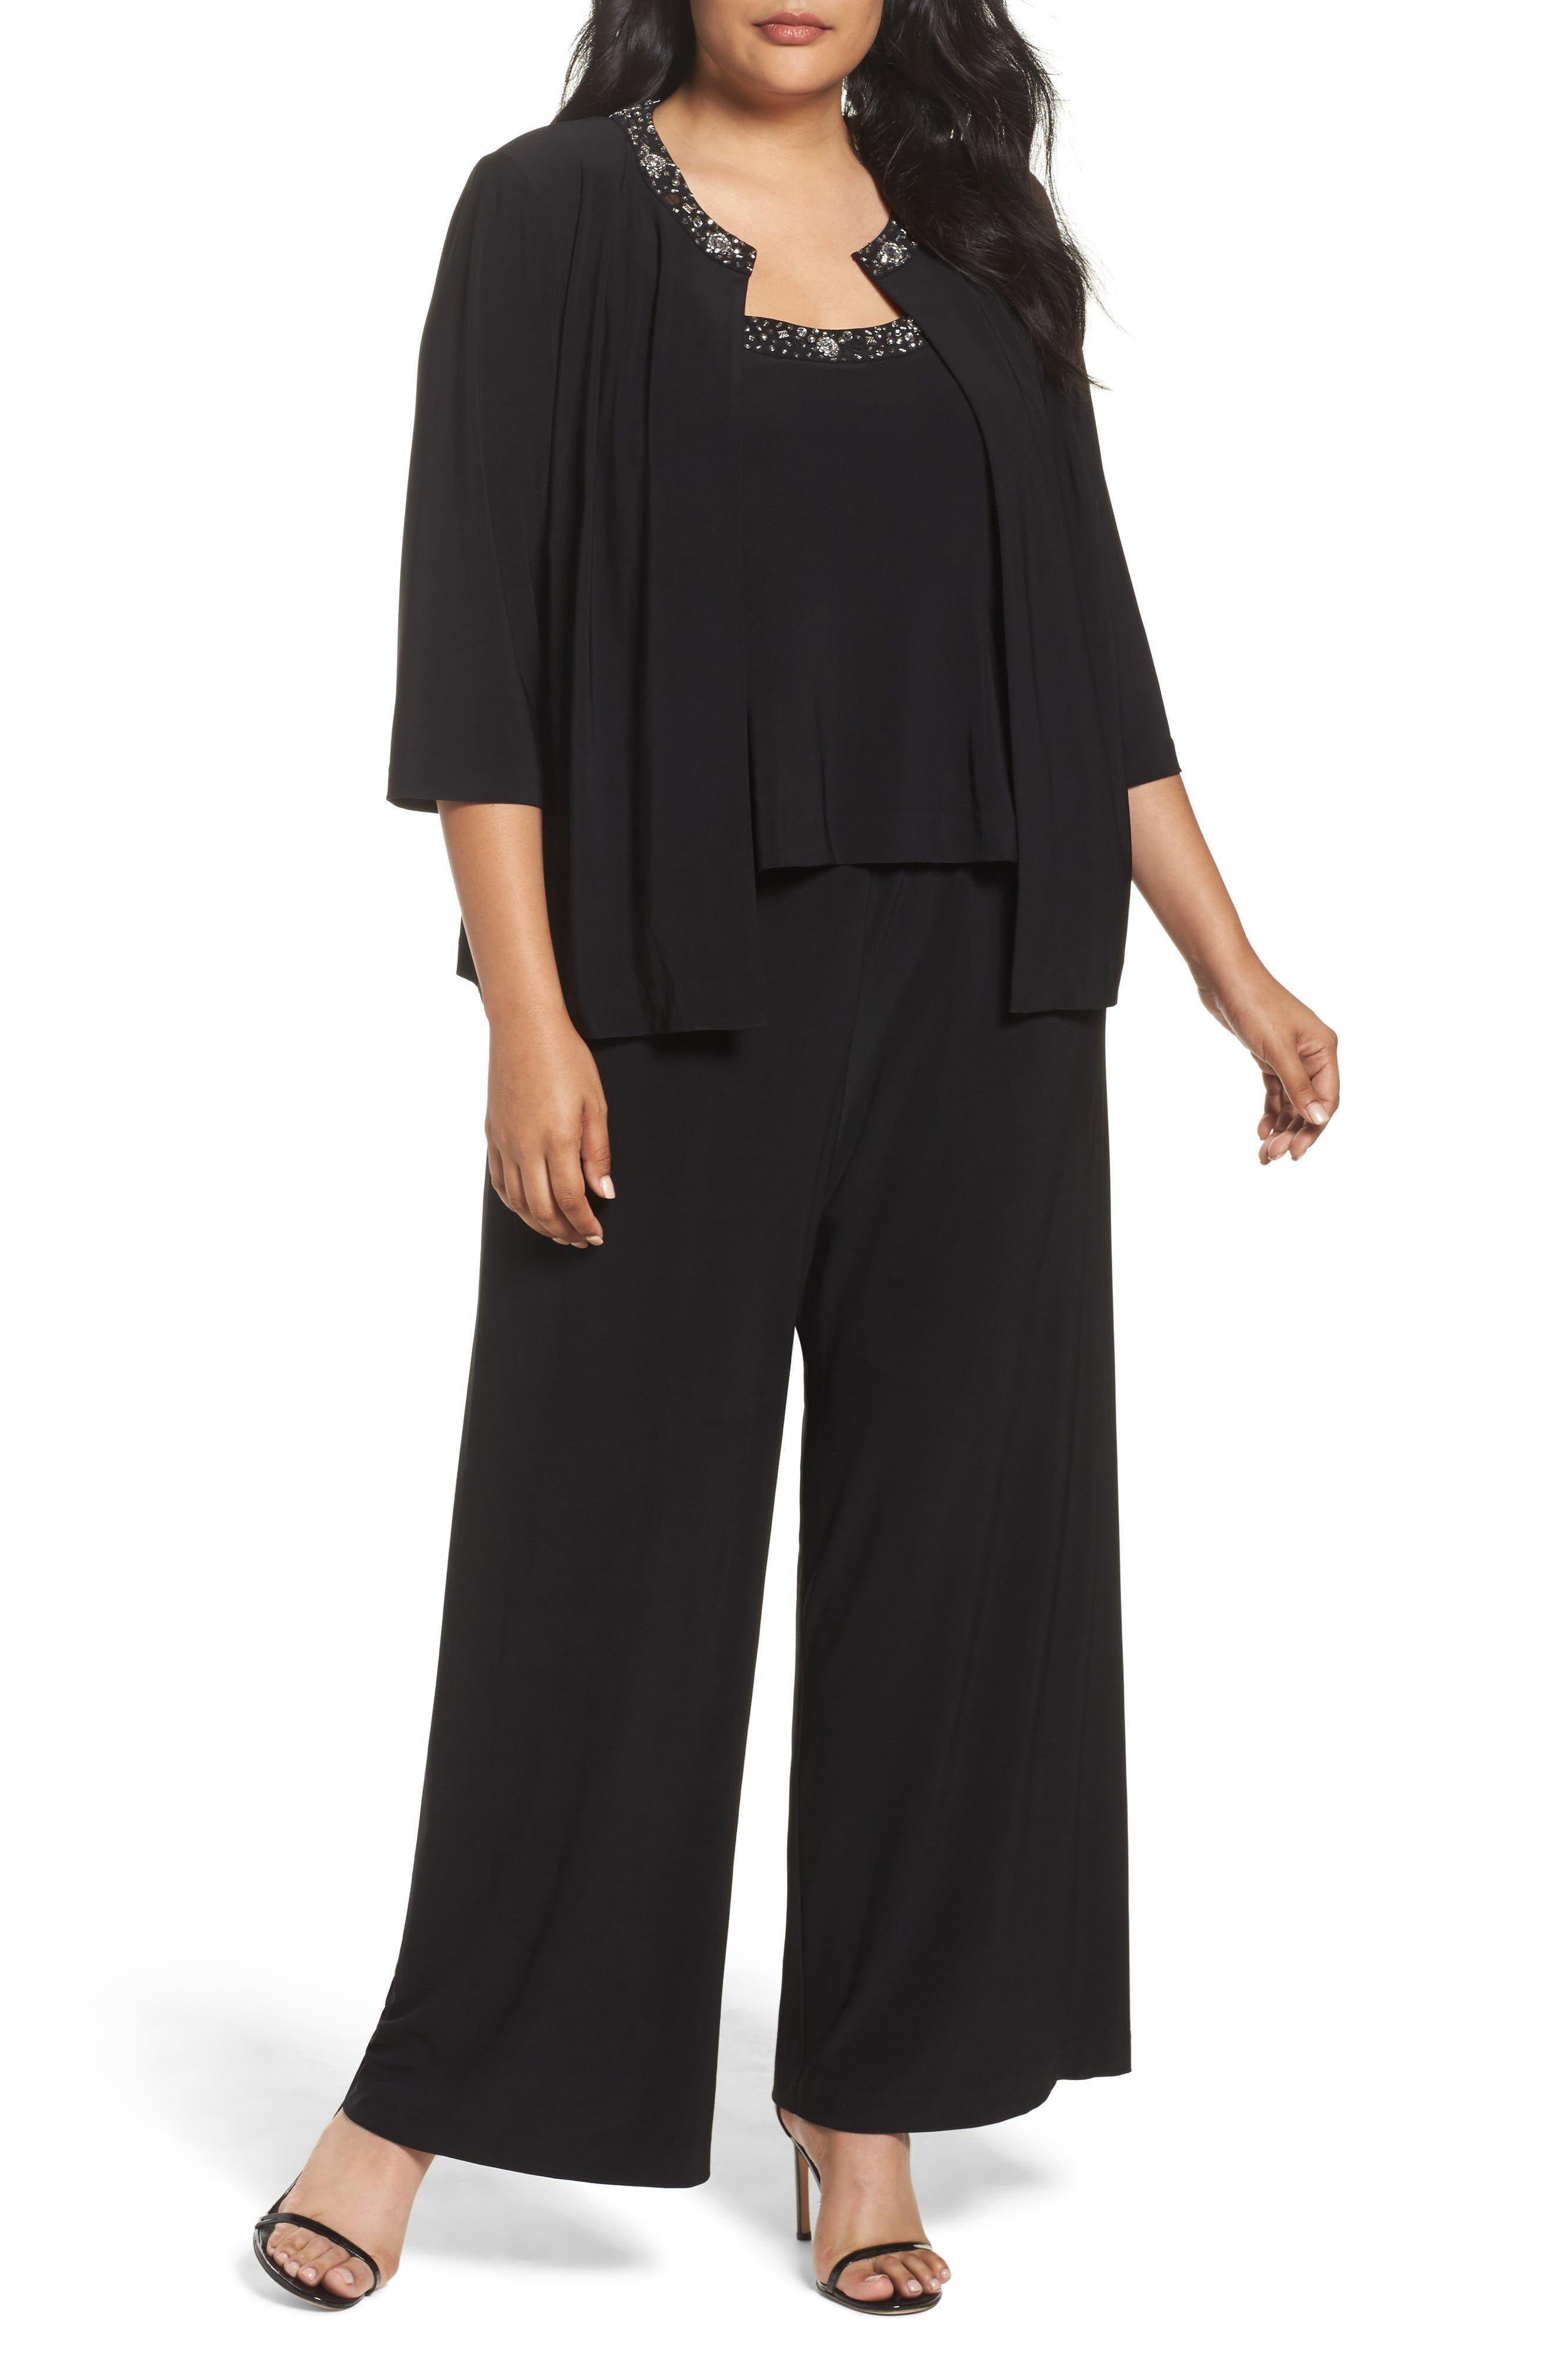 Main Image - Alex Evenings Embellished Three-Piece Pant Suit (Plus Size)